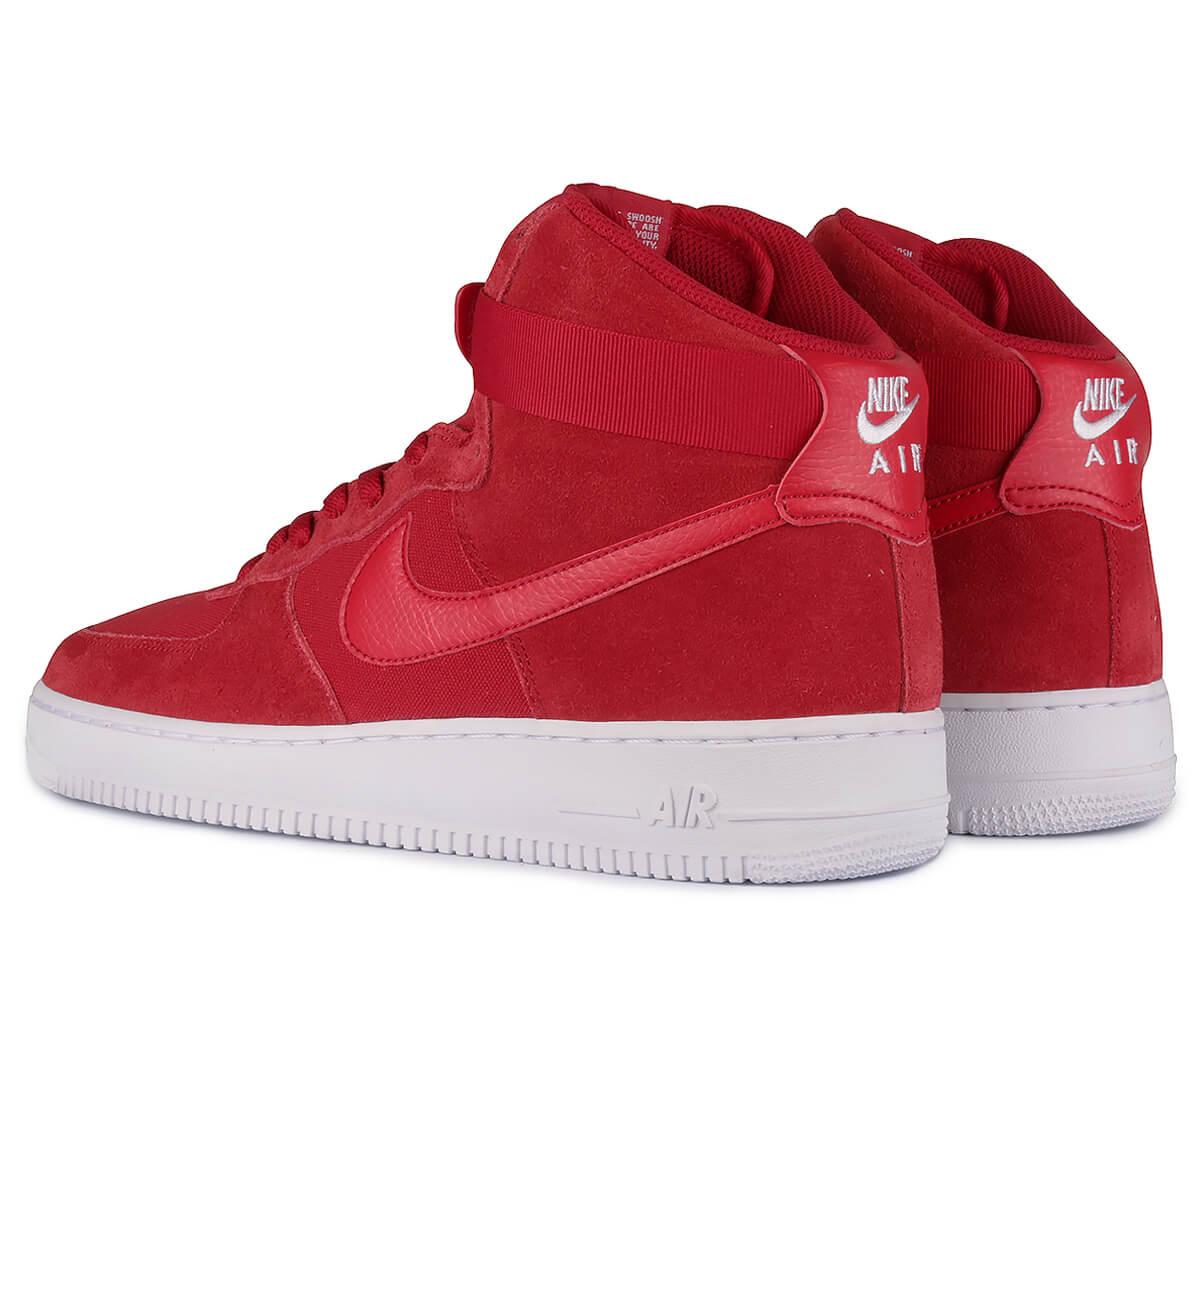 nike air force 1 high rouge